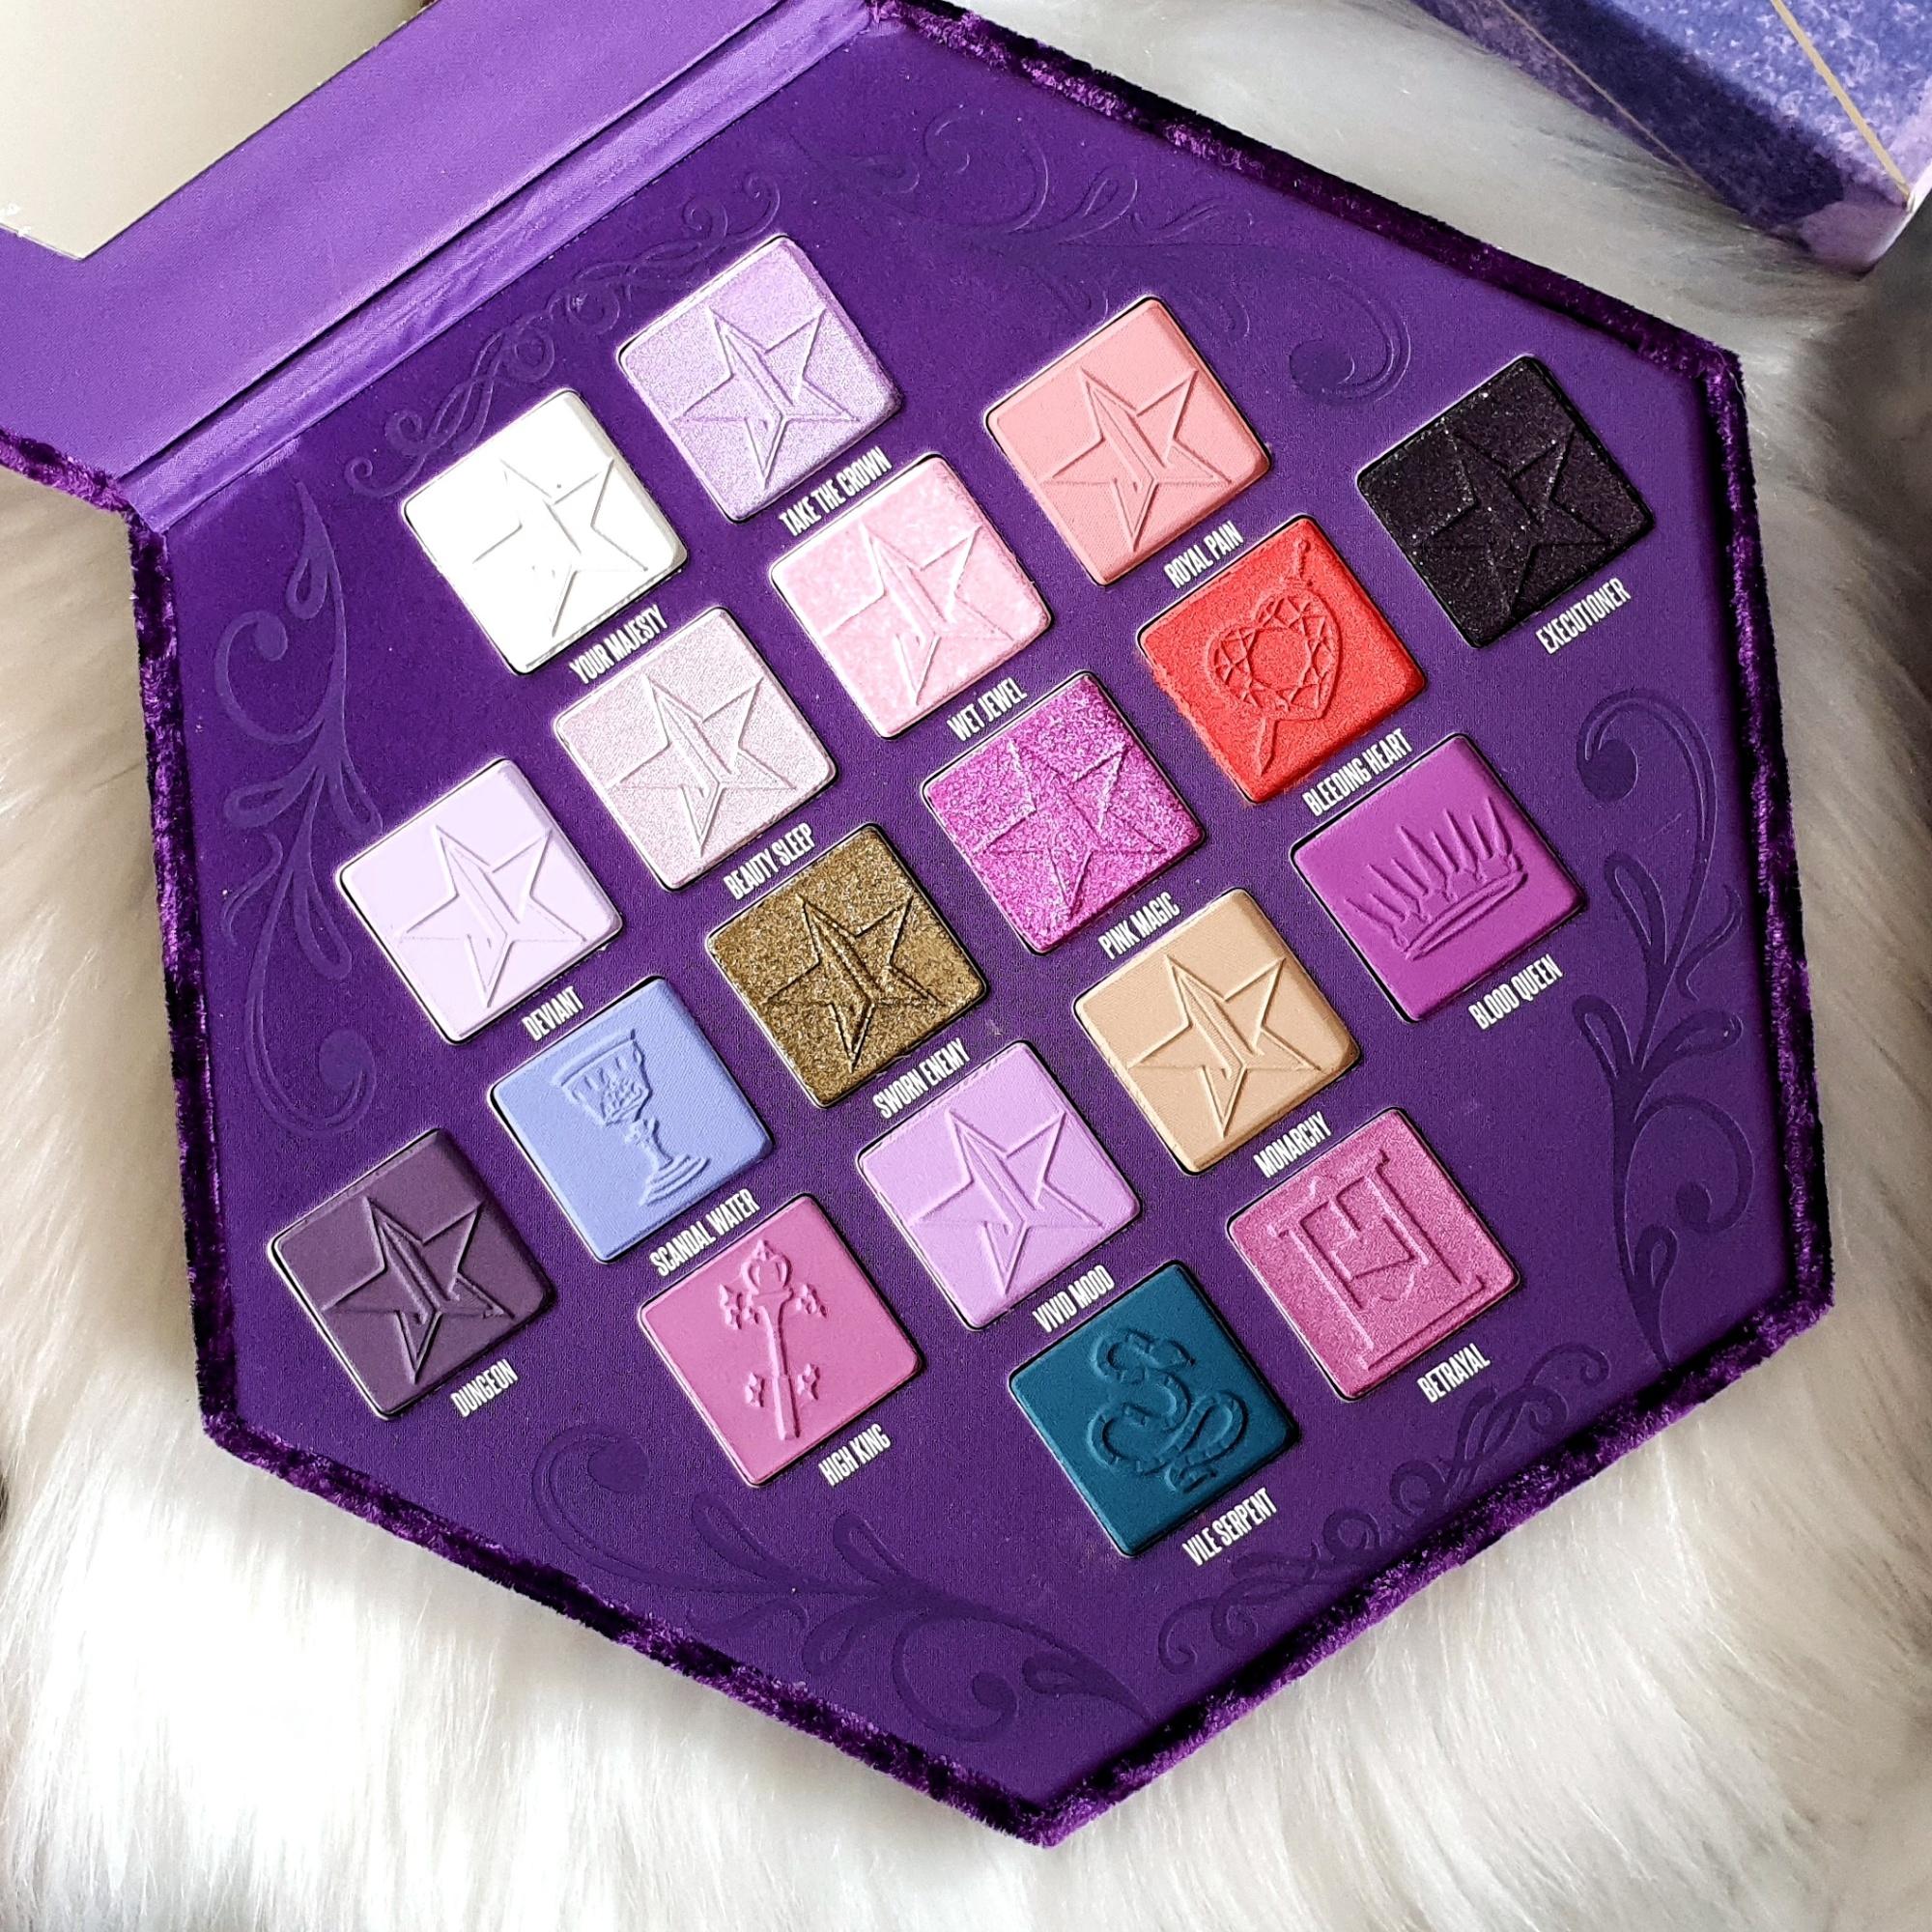 Jeffree Star Cosmetics' Blood Lust Palette Close-up